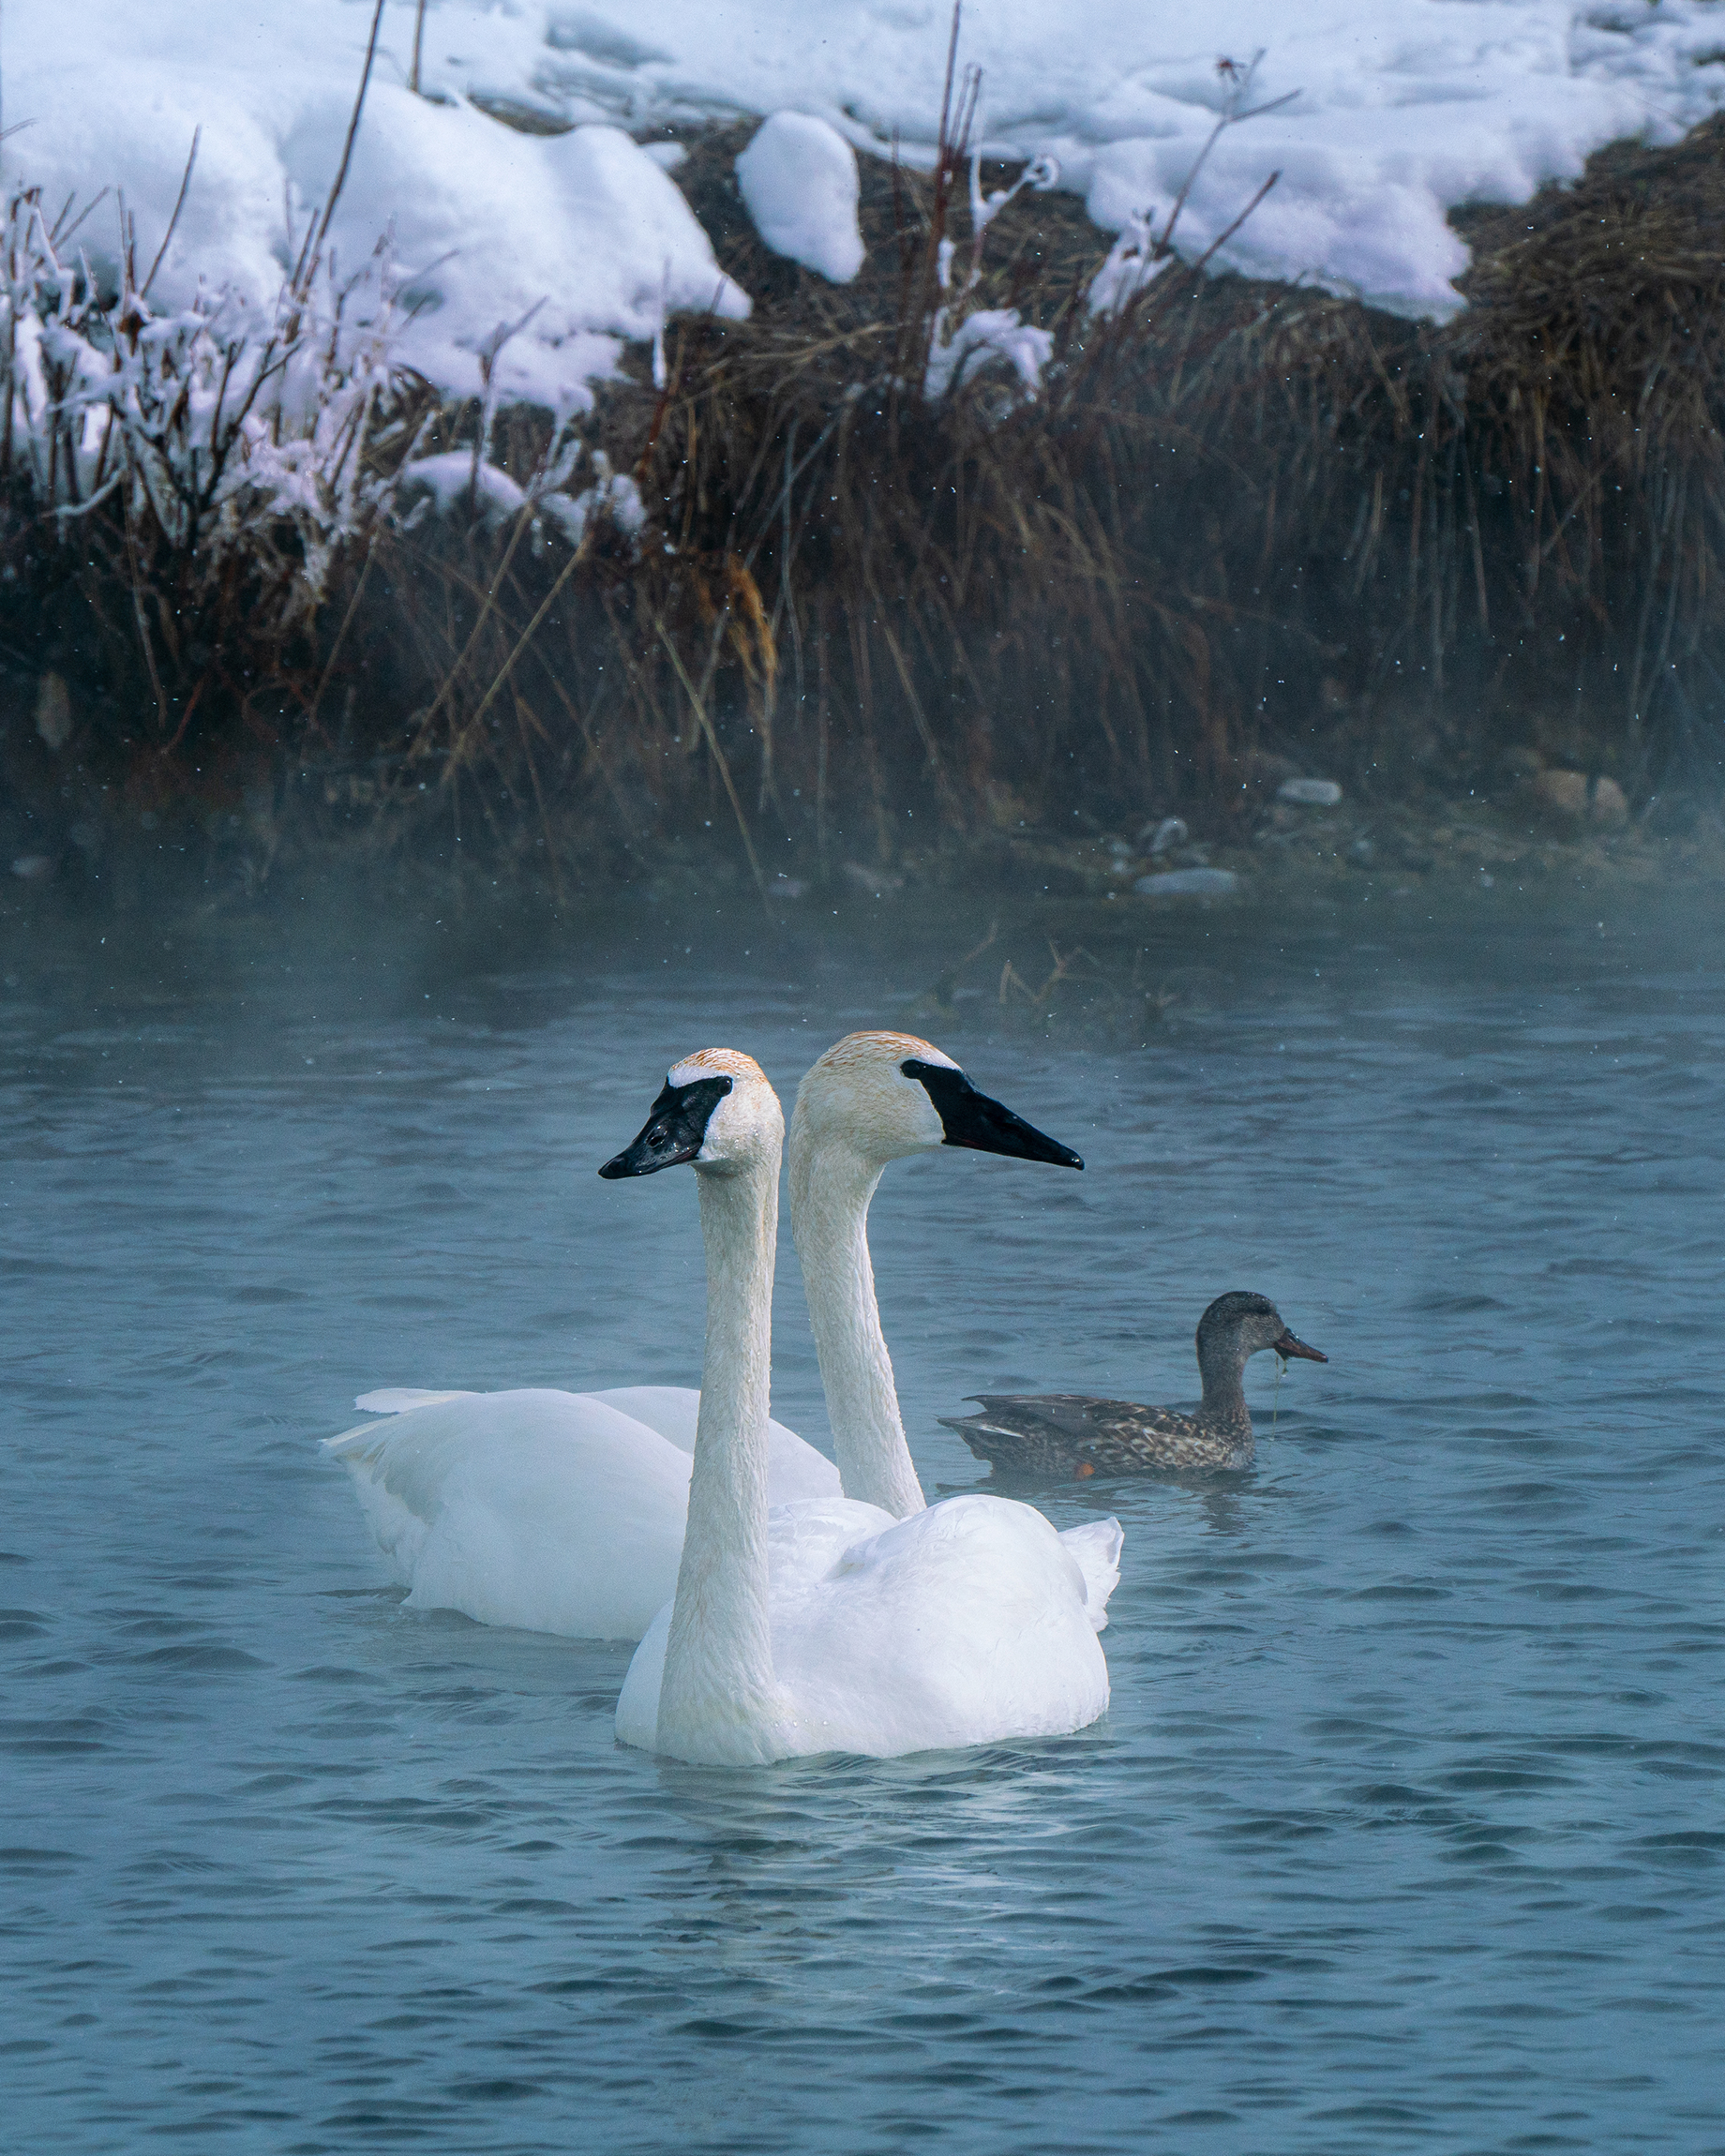 #trumpeterswans, #swans, #duck, #symbiotic, #snow, #hotspring, #hotsprings, #kellym #jacksonhole, #wyoming, #winter, #wildlife, #wildlifephotography